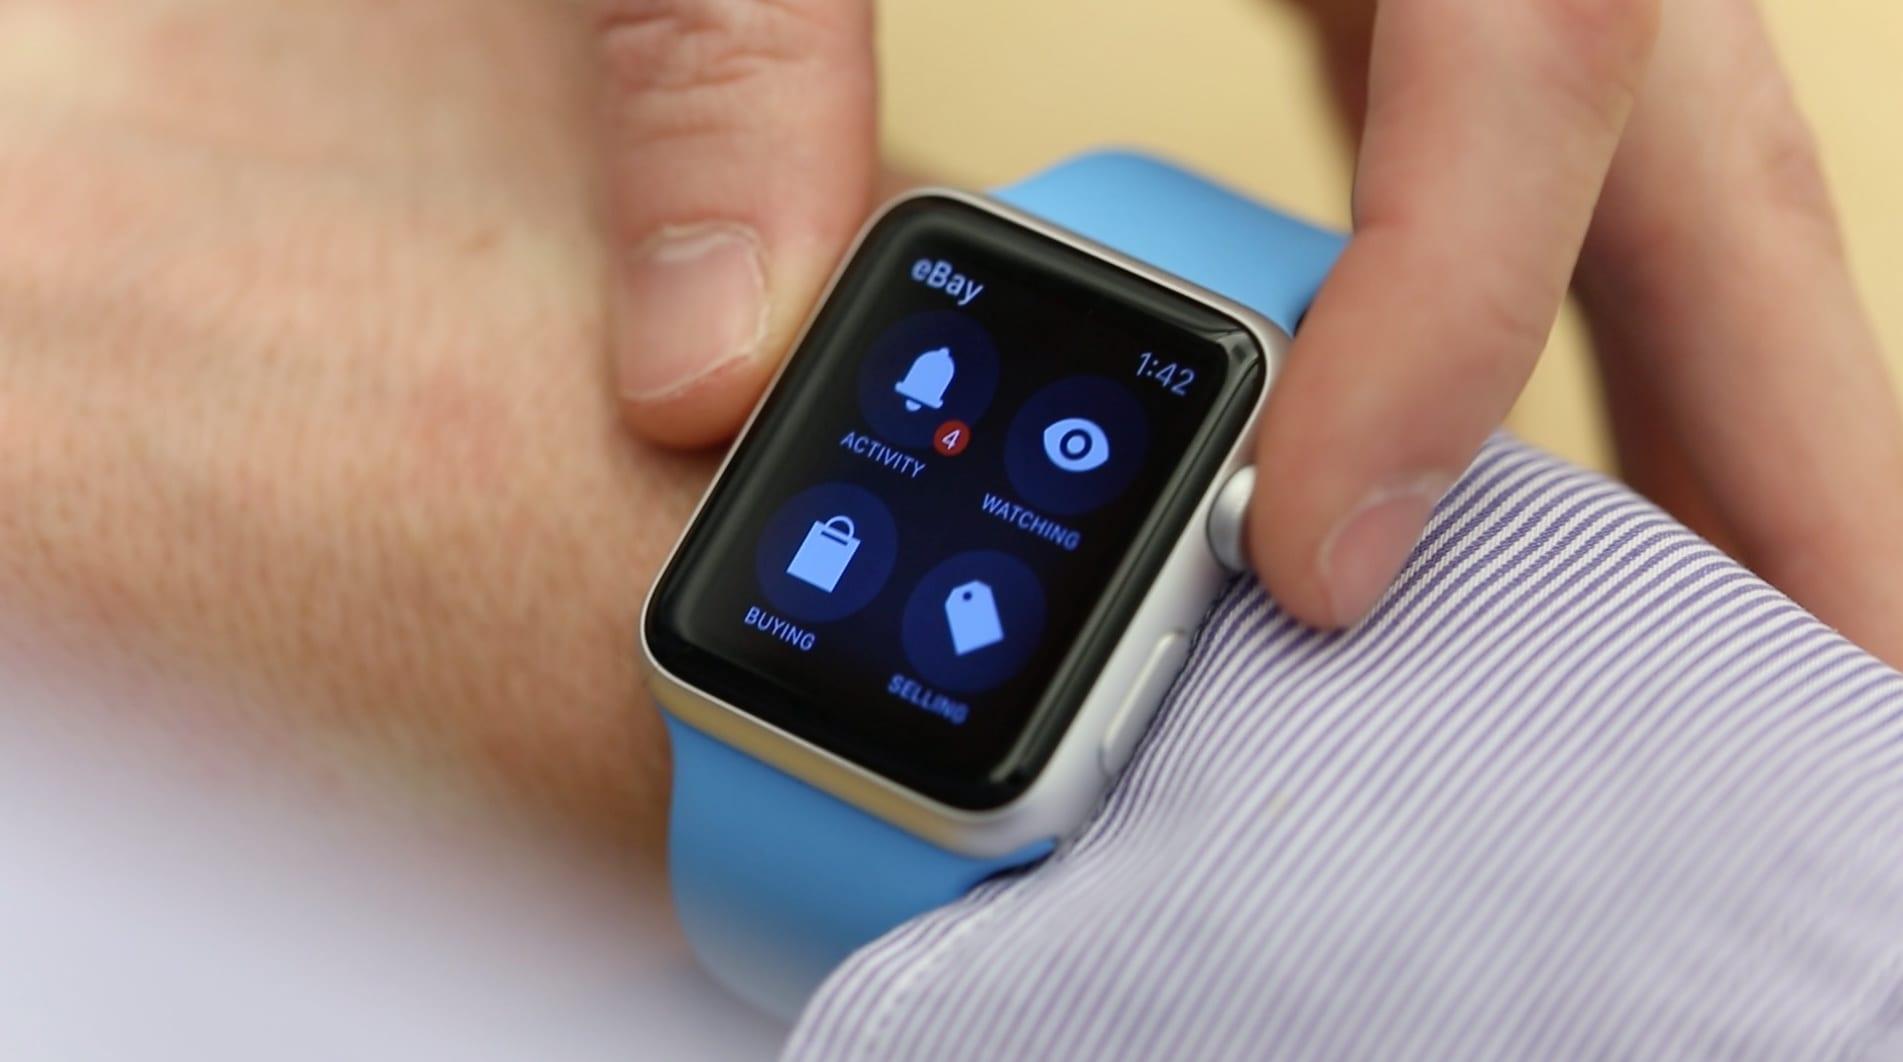 eBay-for-Apple-Watch-teaser-001